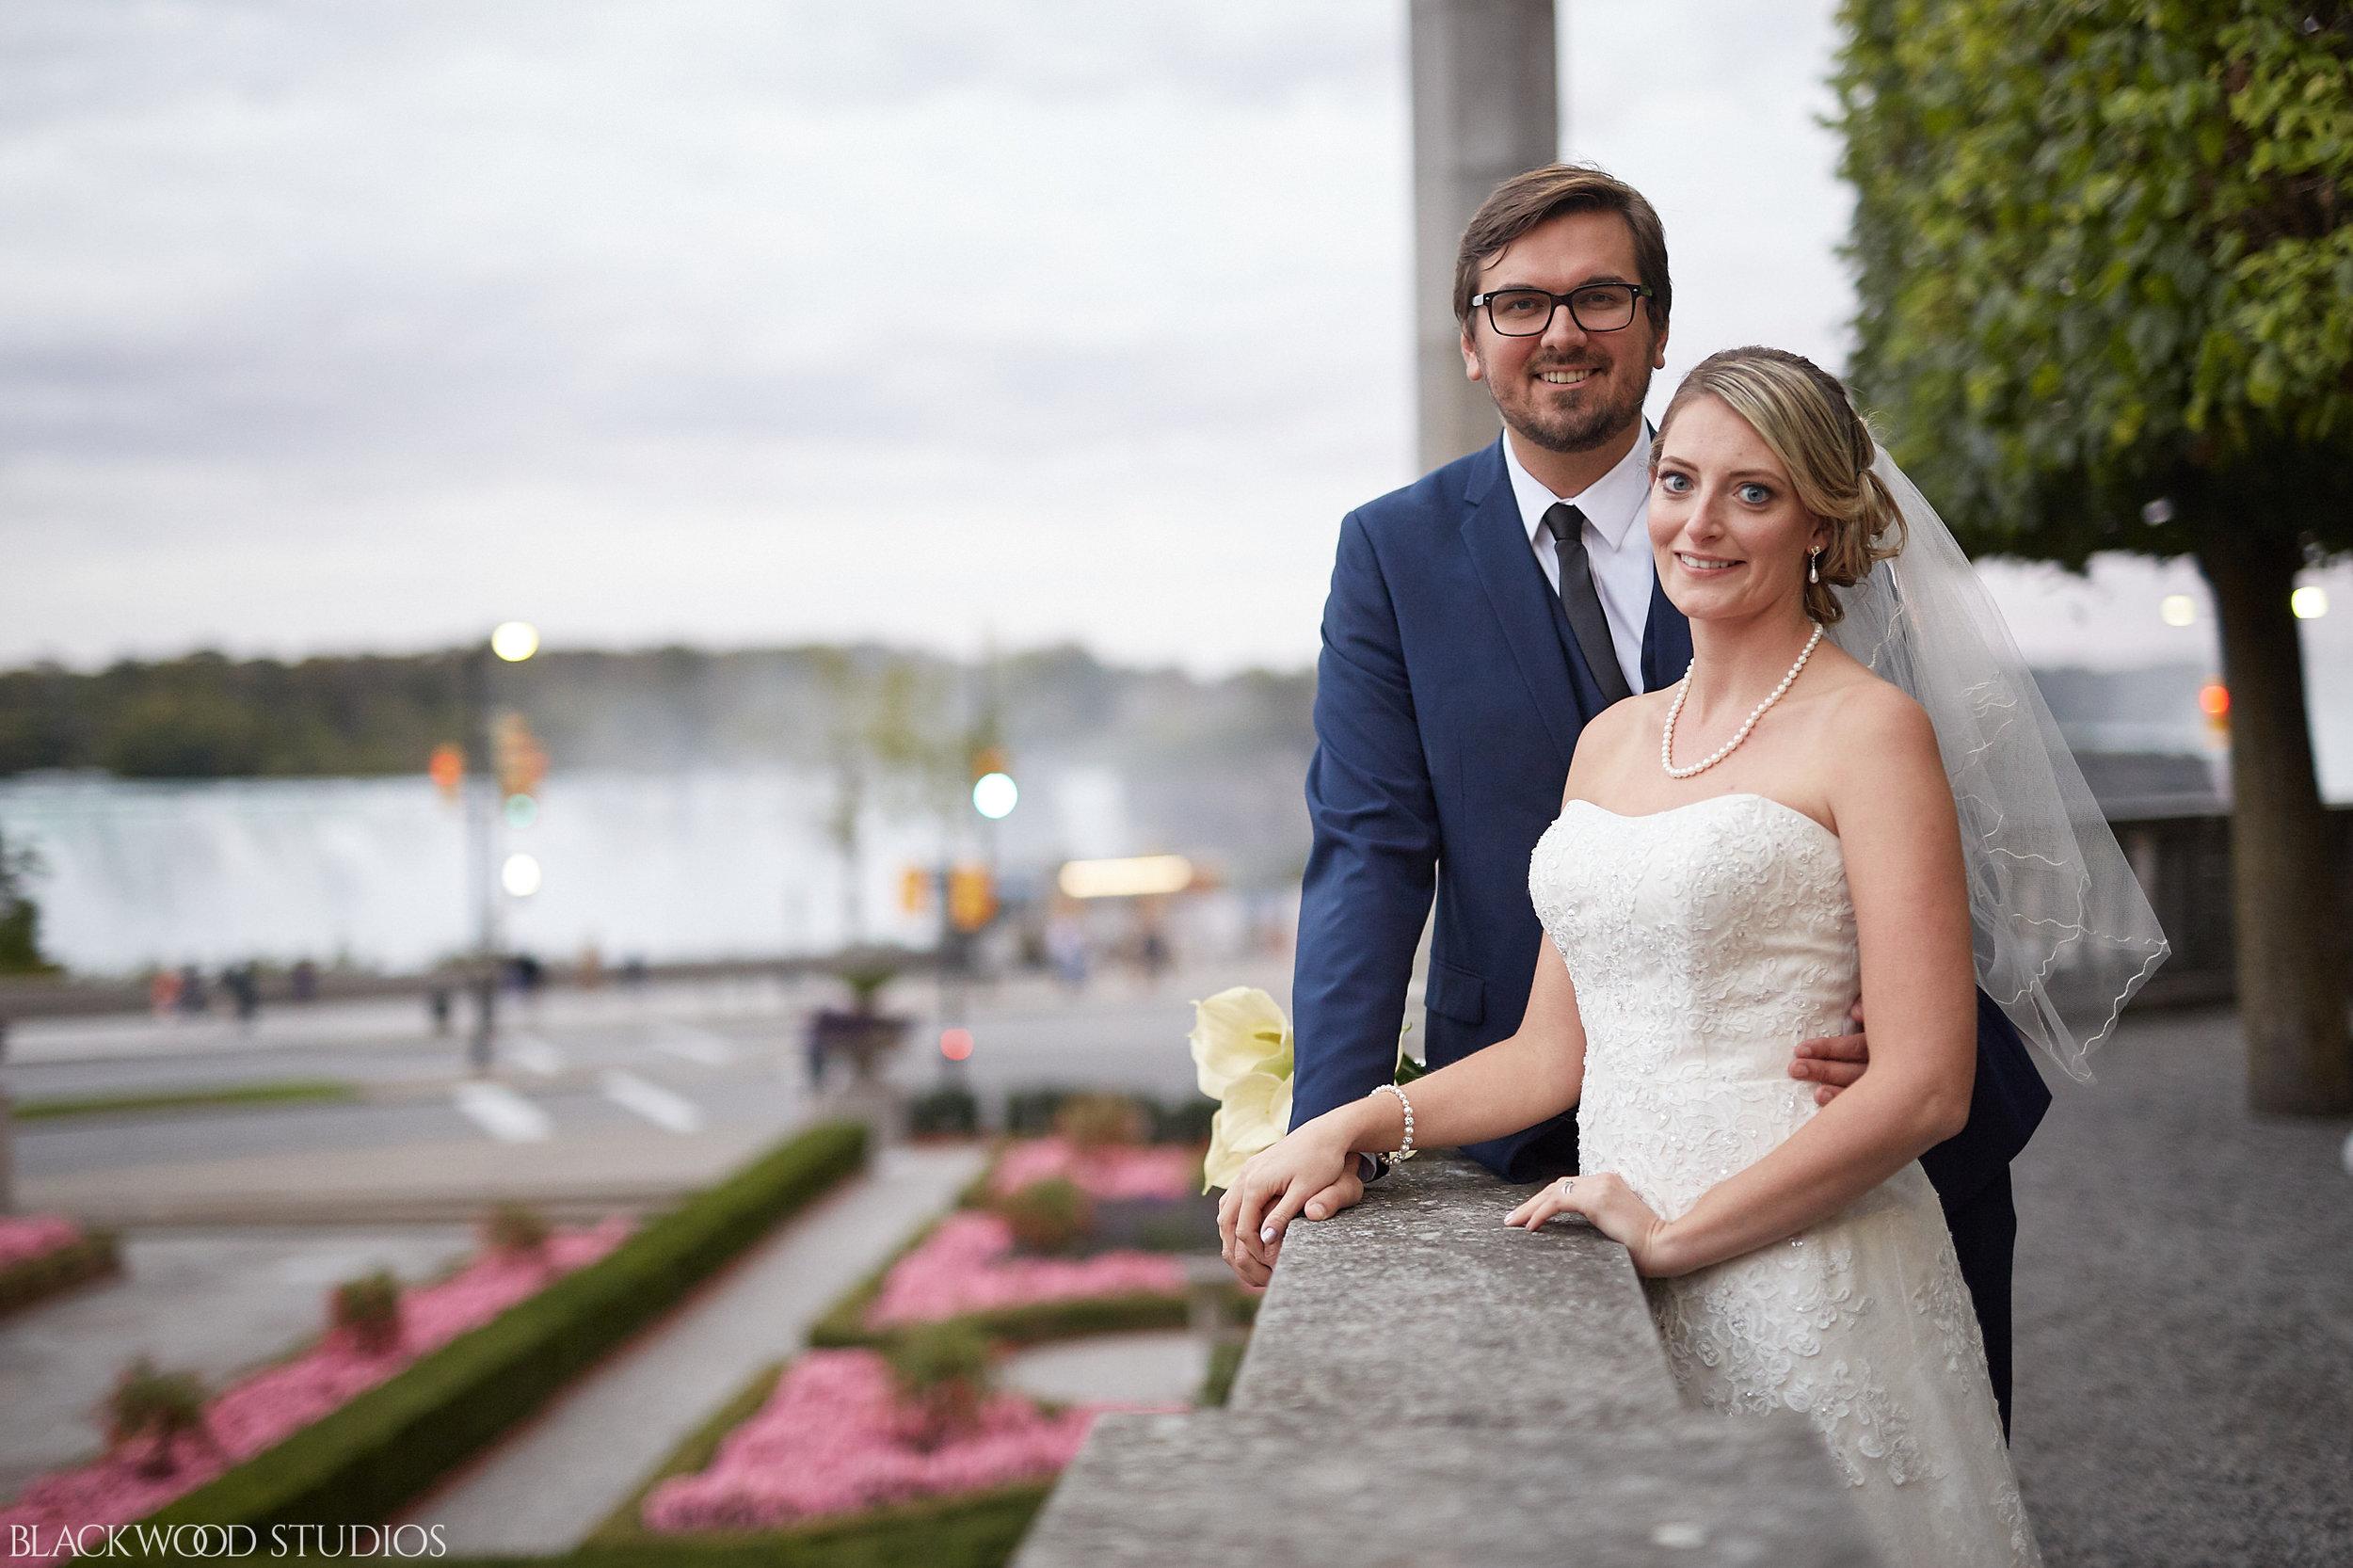 Blackwood-Studios-Wedding-Photography-20170928-190028-Marek-Katie-Michalek-Oakes-Garden-Theatre-Niagara-Falls-Ontario-Canada.jpg